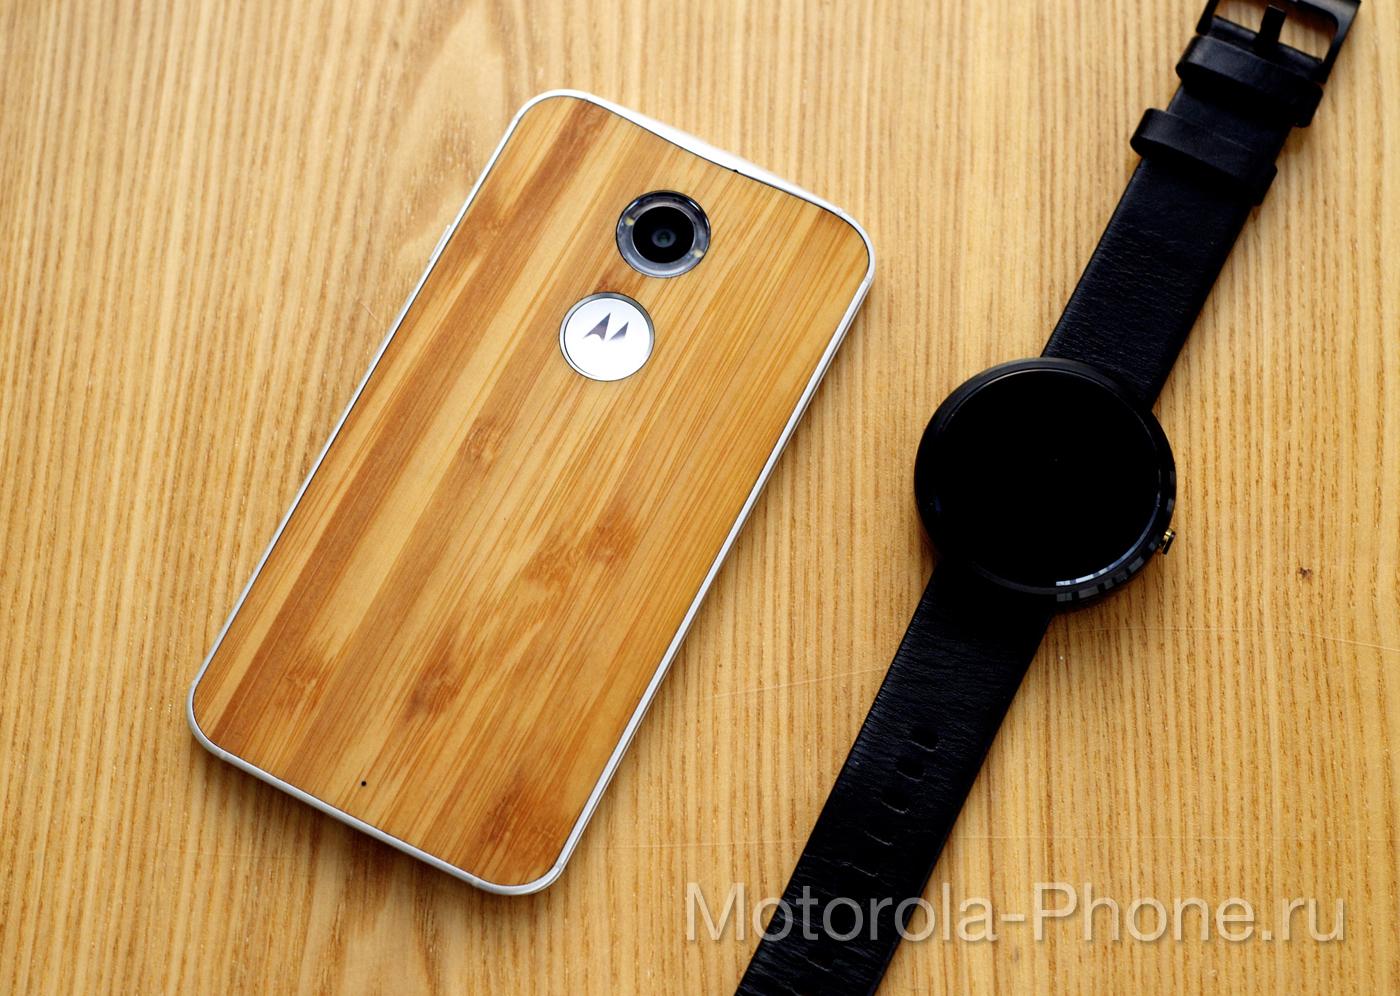 Motorola-Moto-X-Bamboo-14